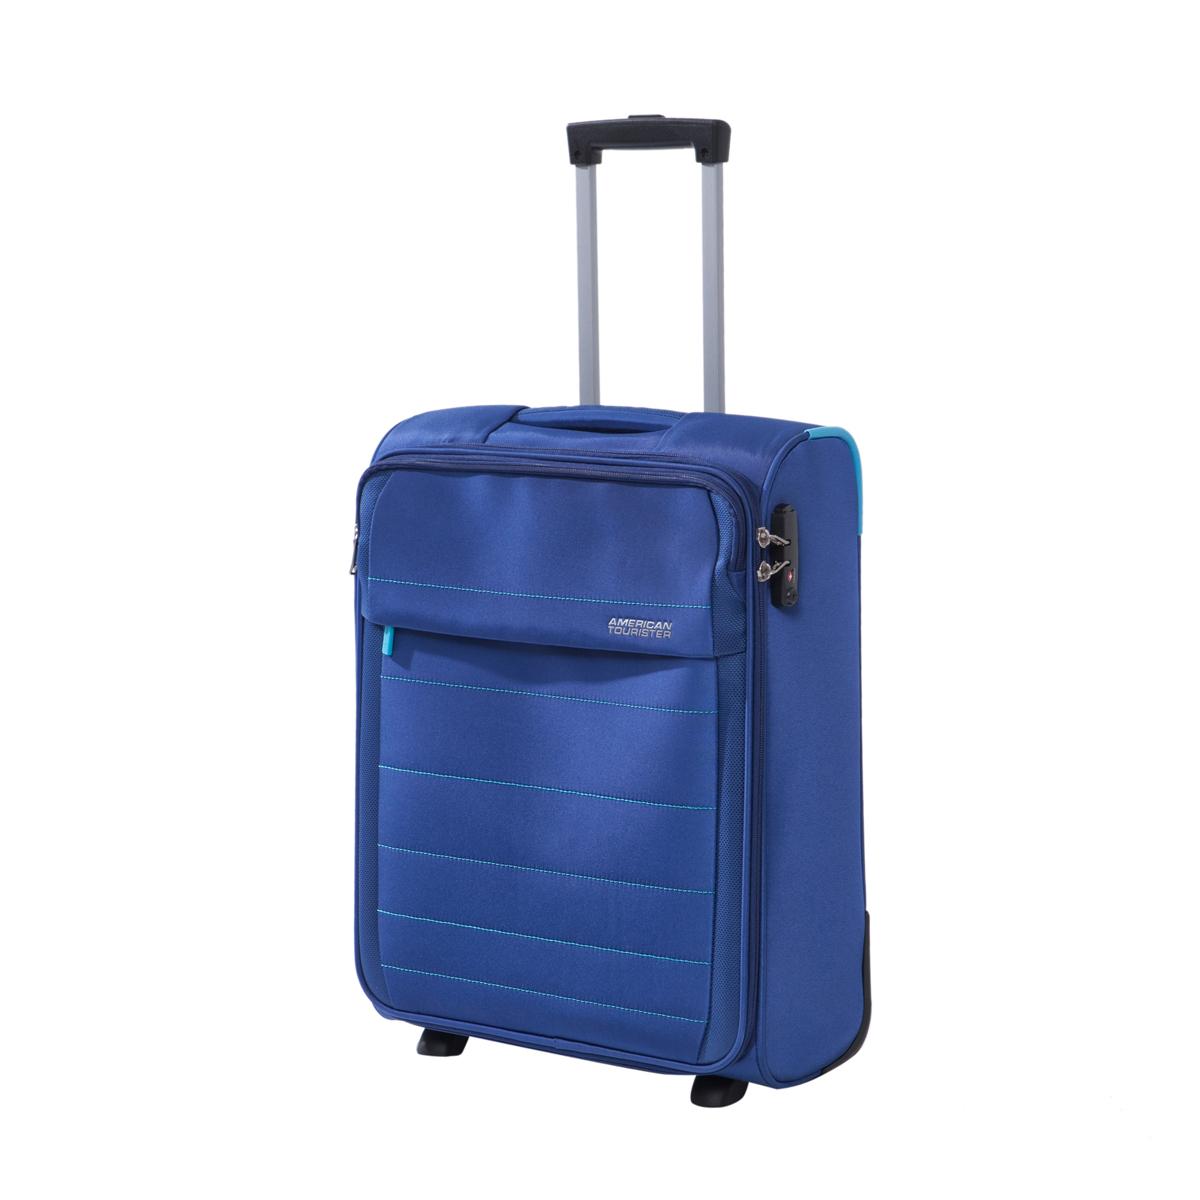 AMERICAN TOURISTER – Βαλίτσα καμπίνας TIDAL American Tourister μπλε